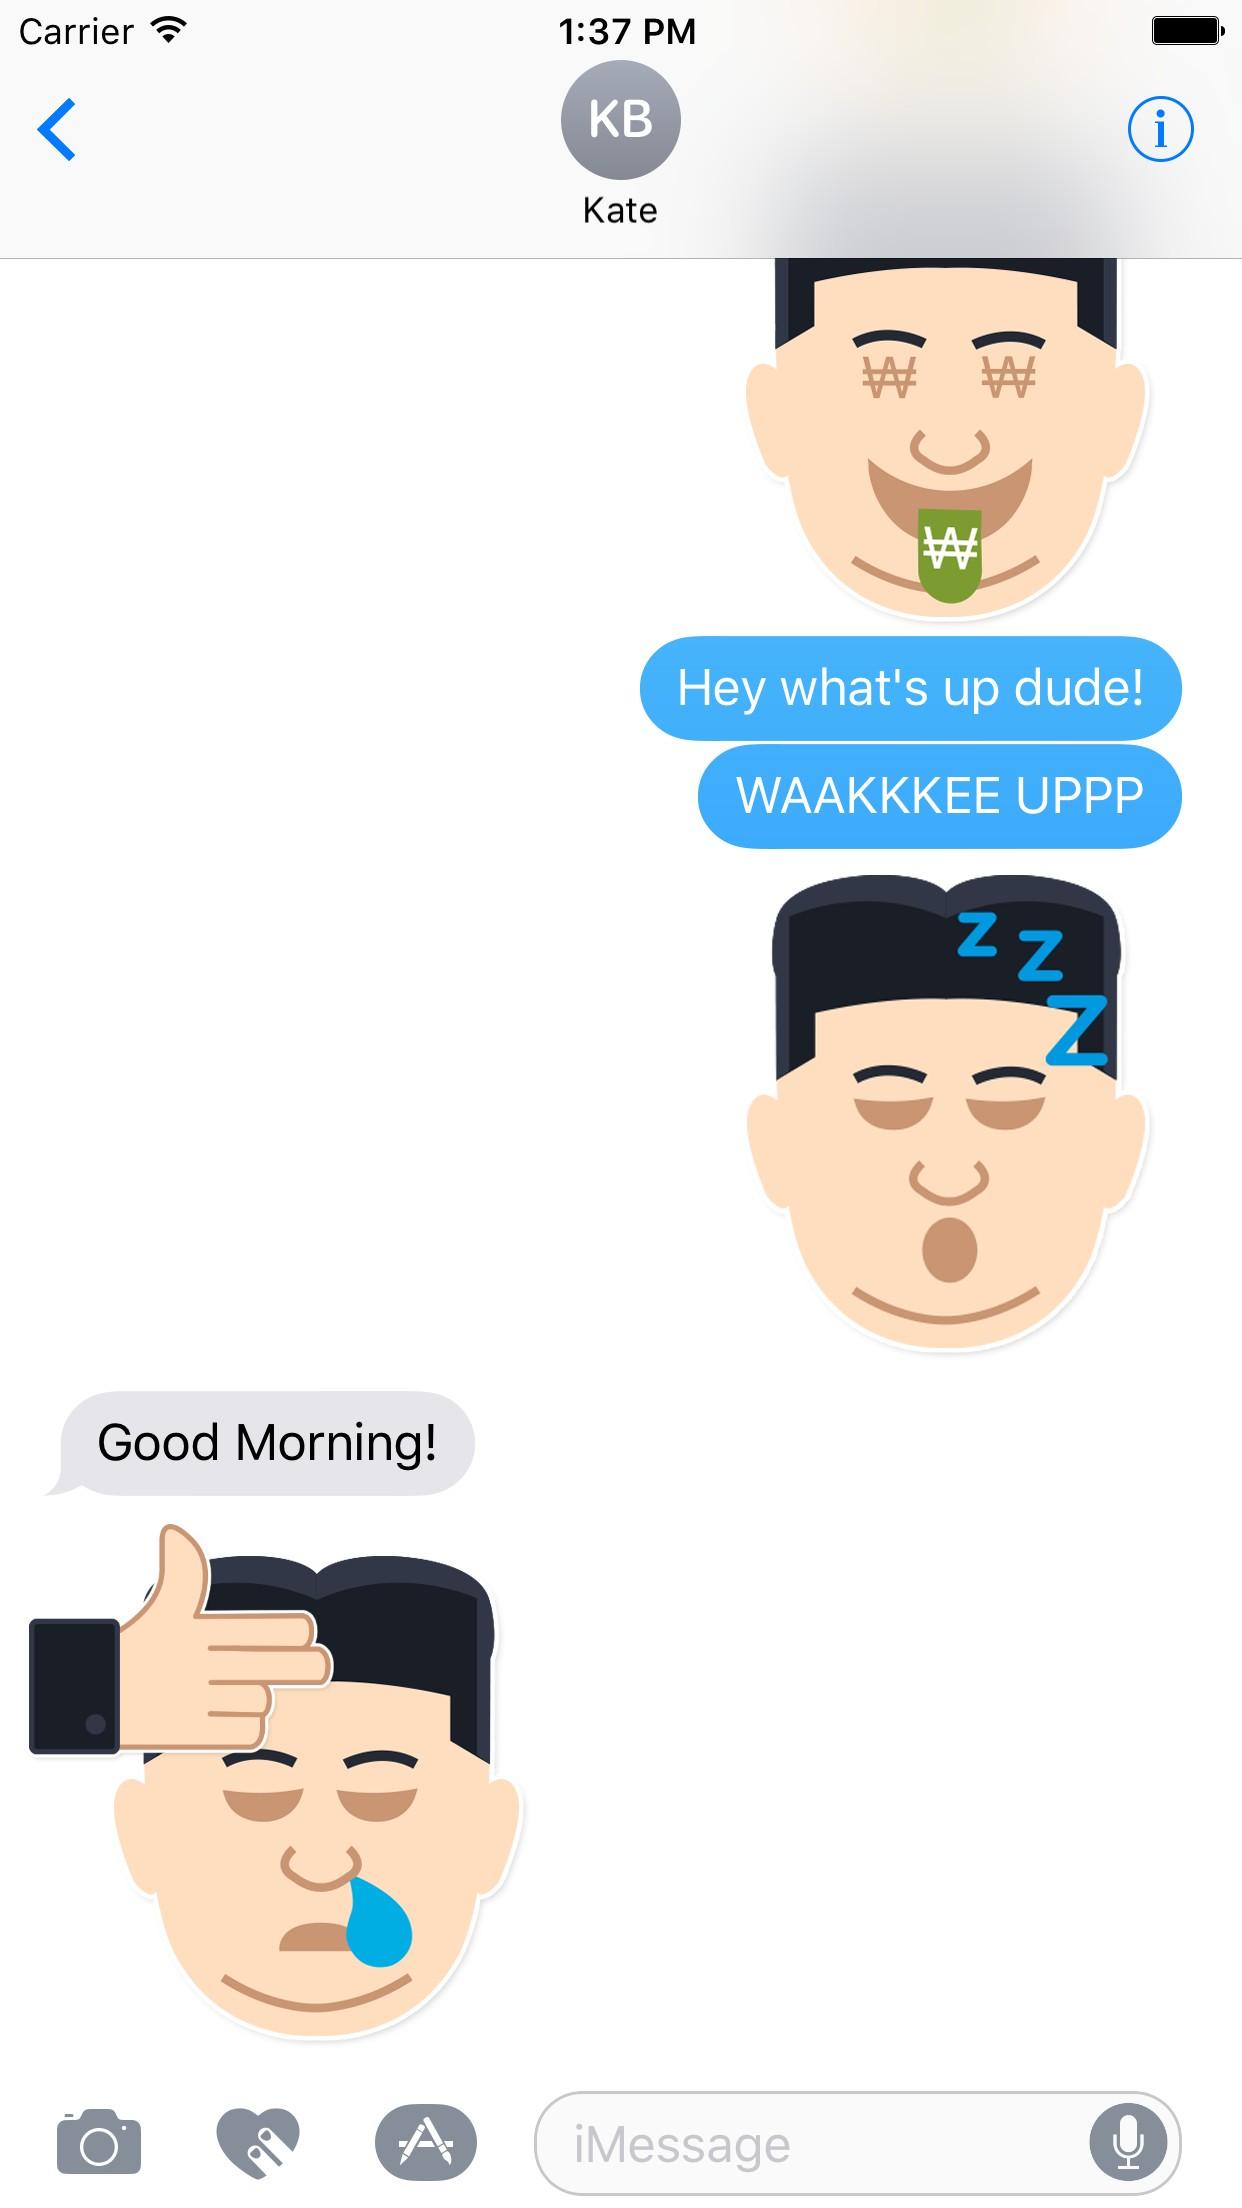 KimSays - Express with Emojis & Stickers